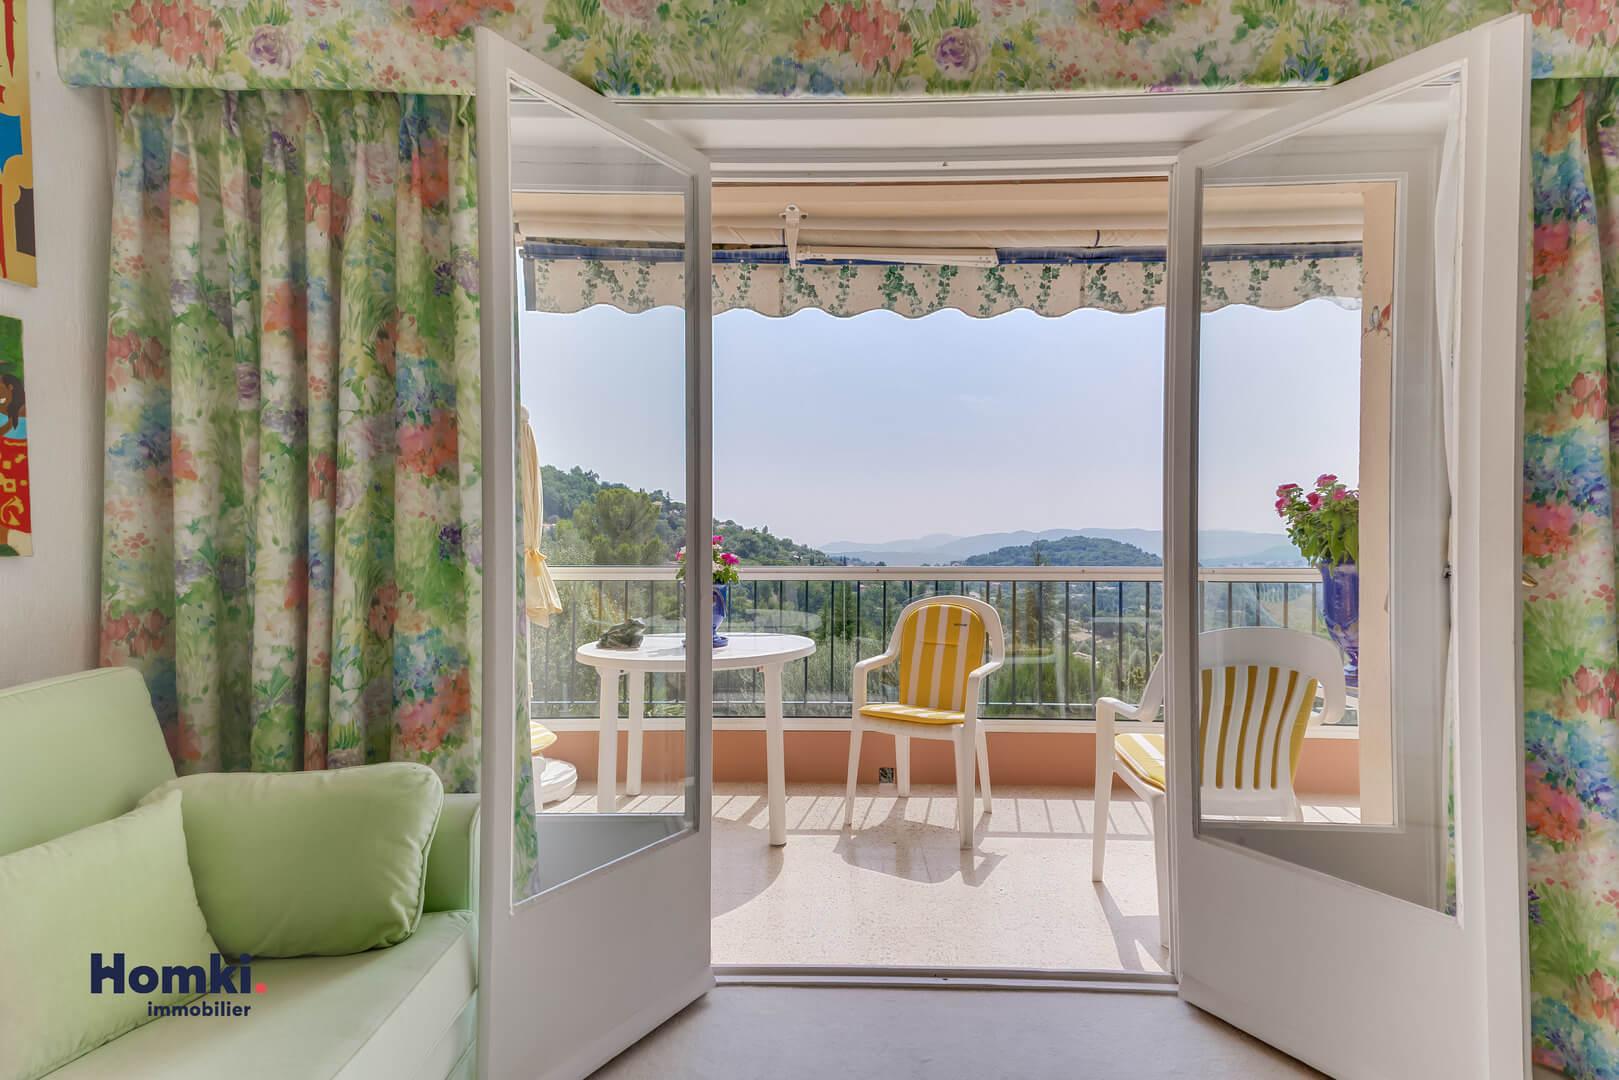 Vente appartement Grasse T3 06520 French Riviera_3